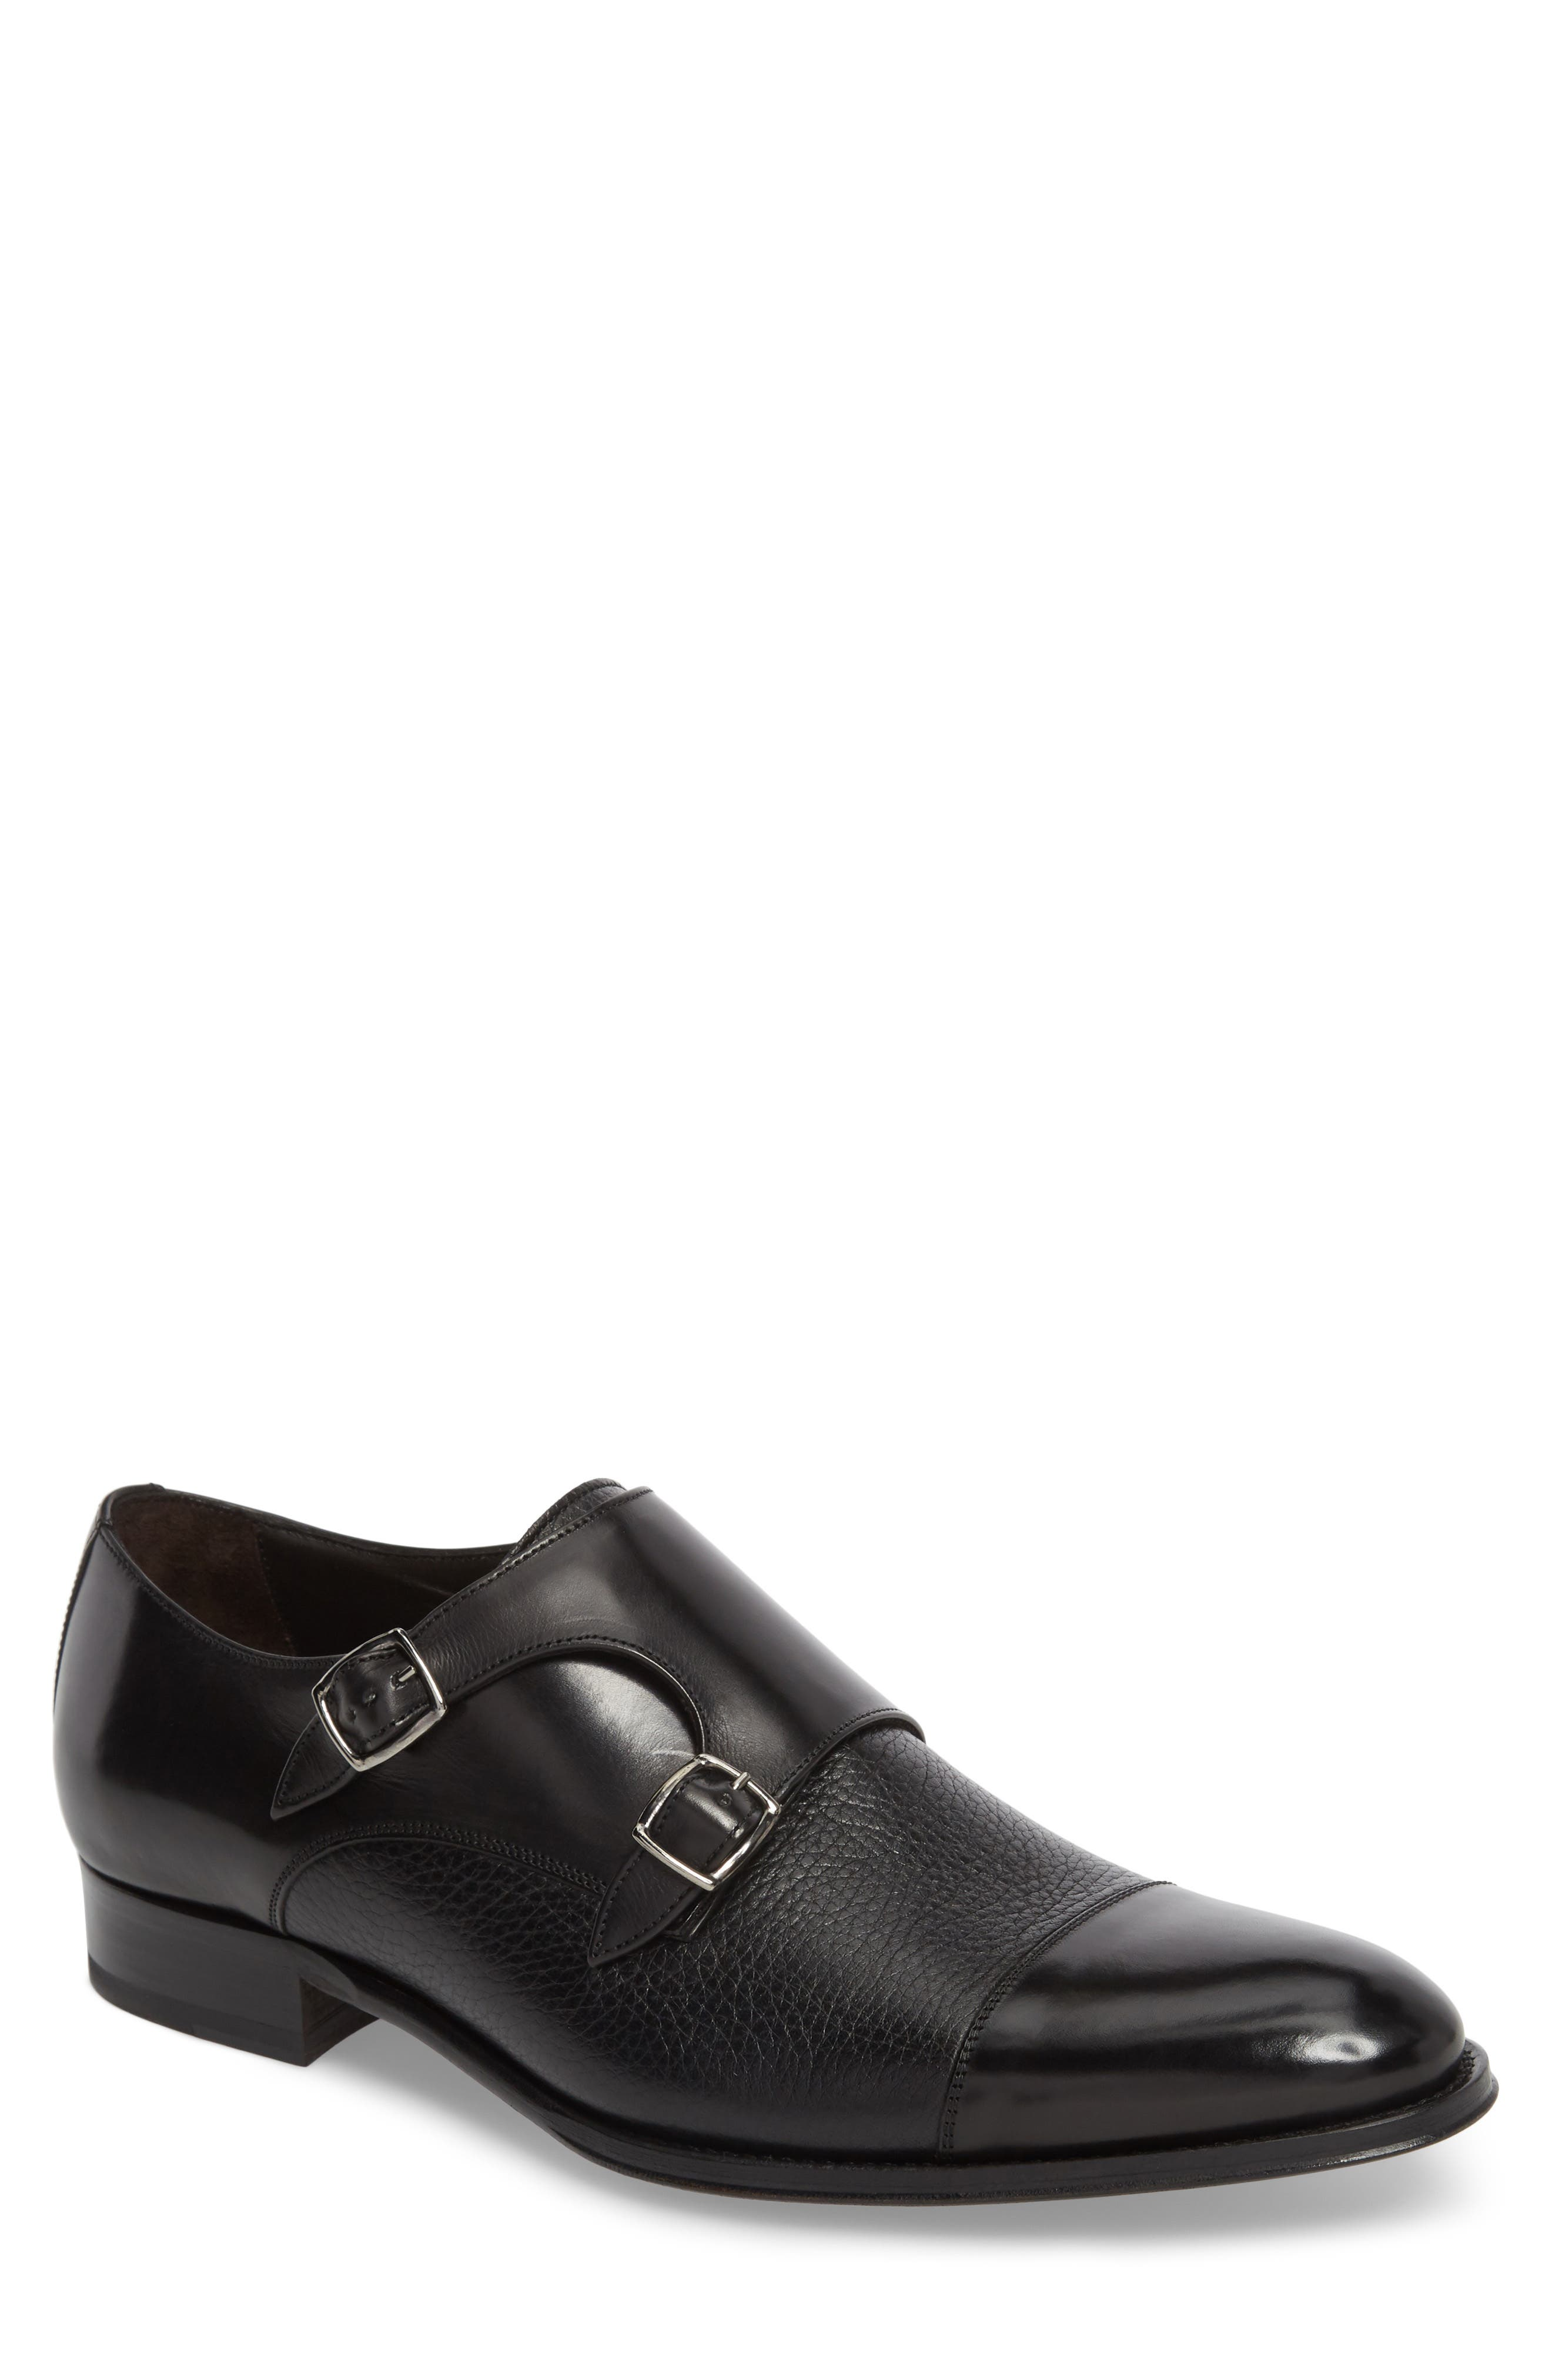 Kiev Double Monk Strap Shoe,                             Main thumbnail 1, color,                             BLACK/ BLACK LEATHER